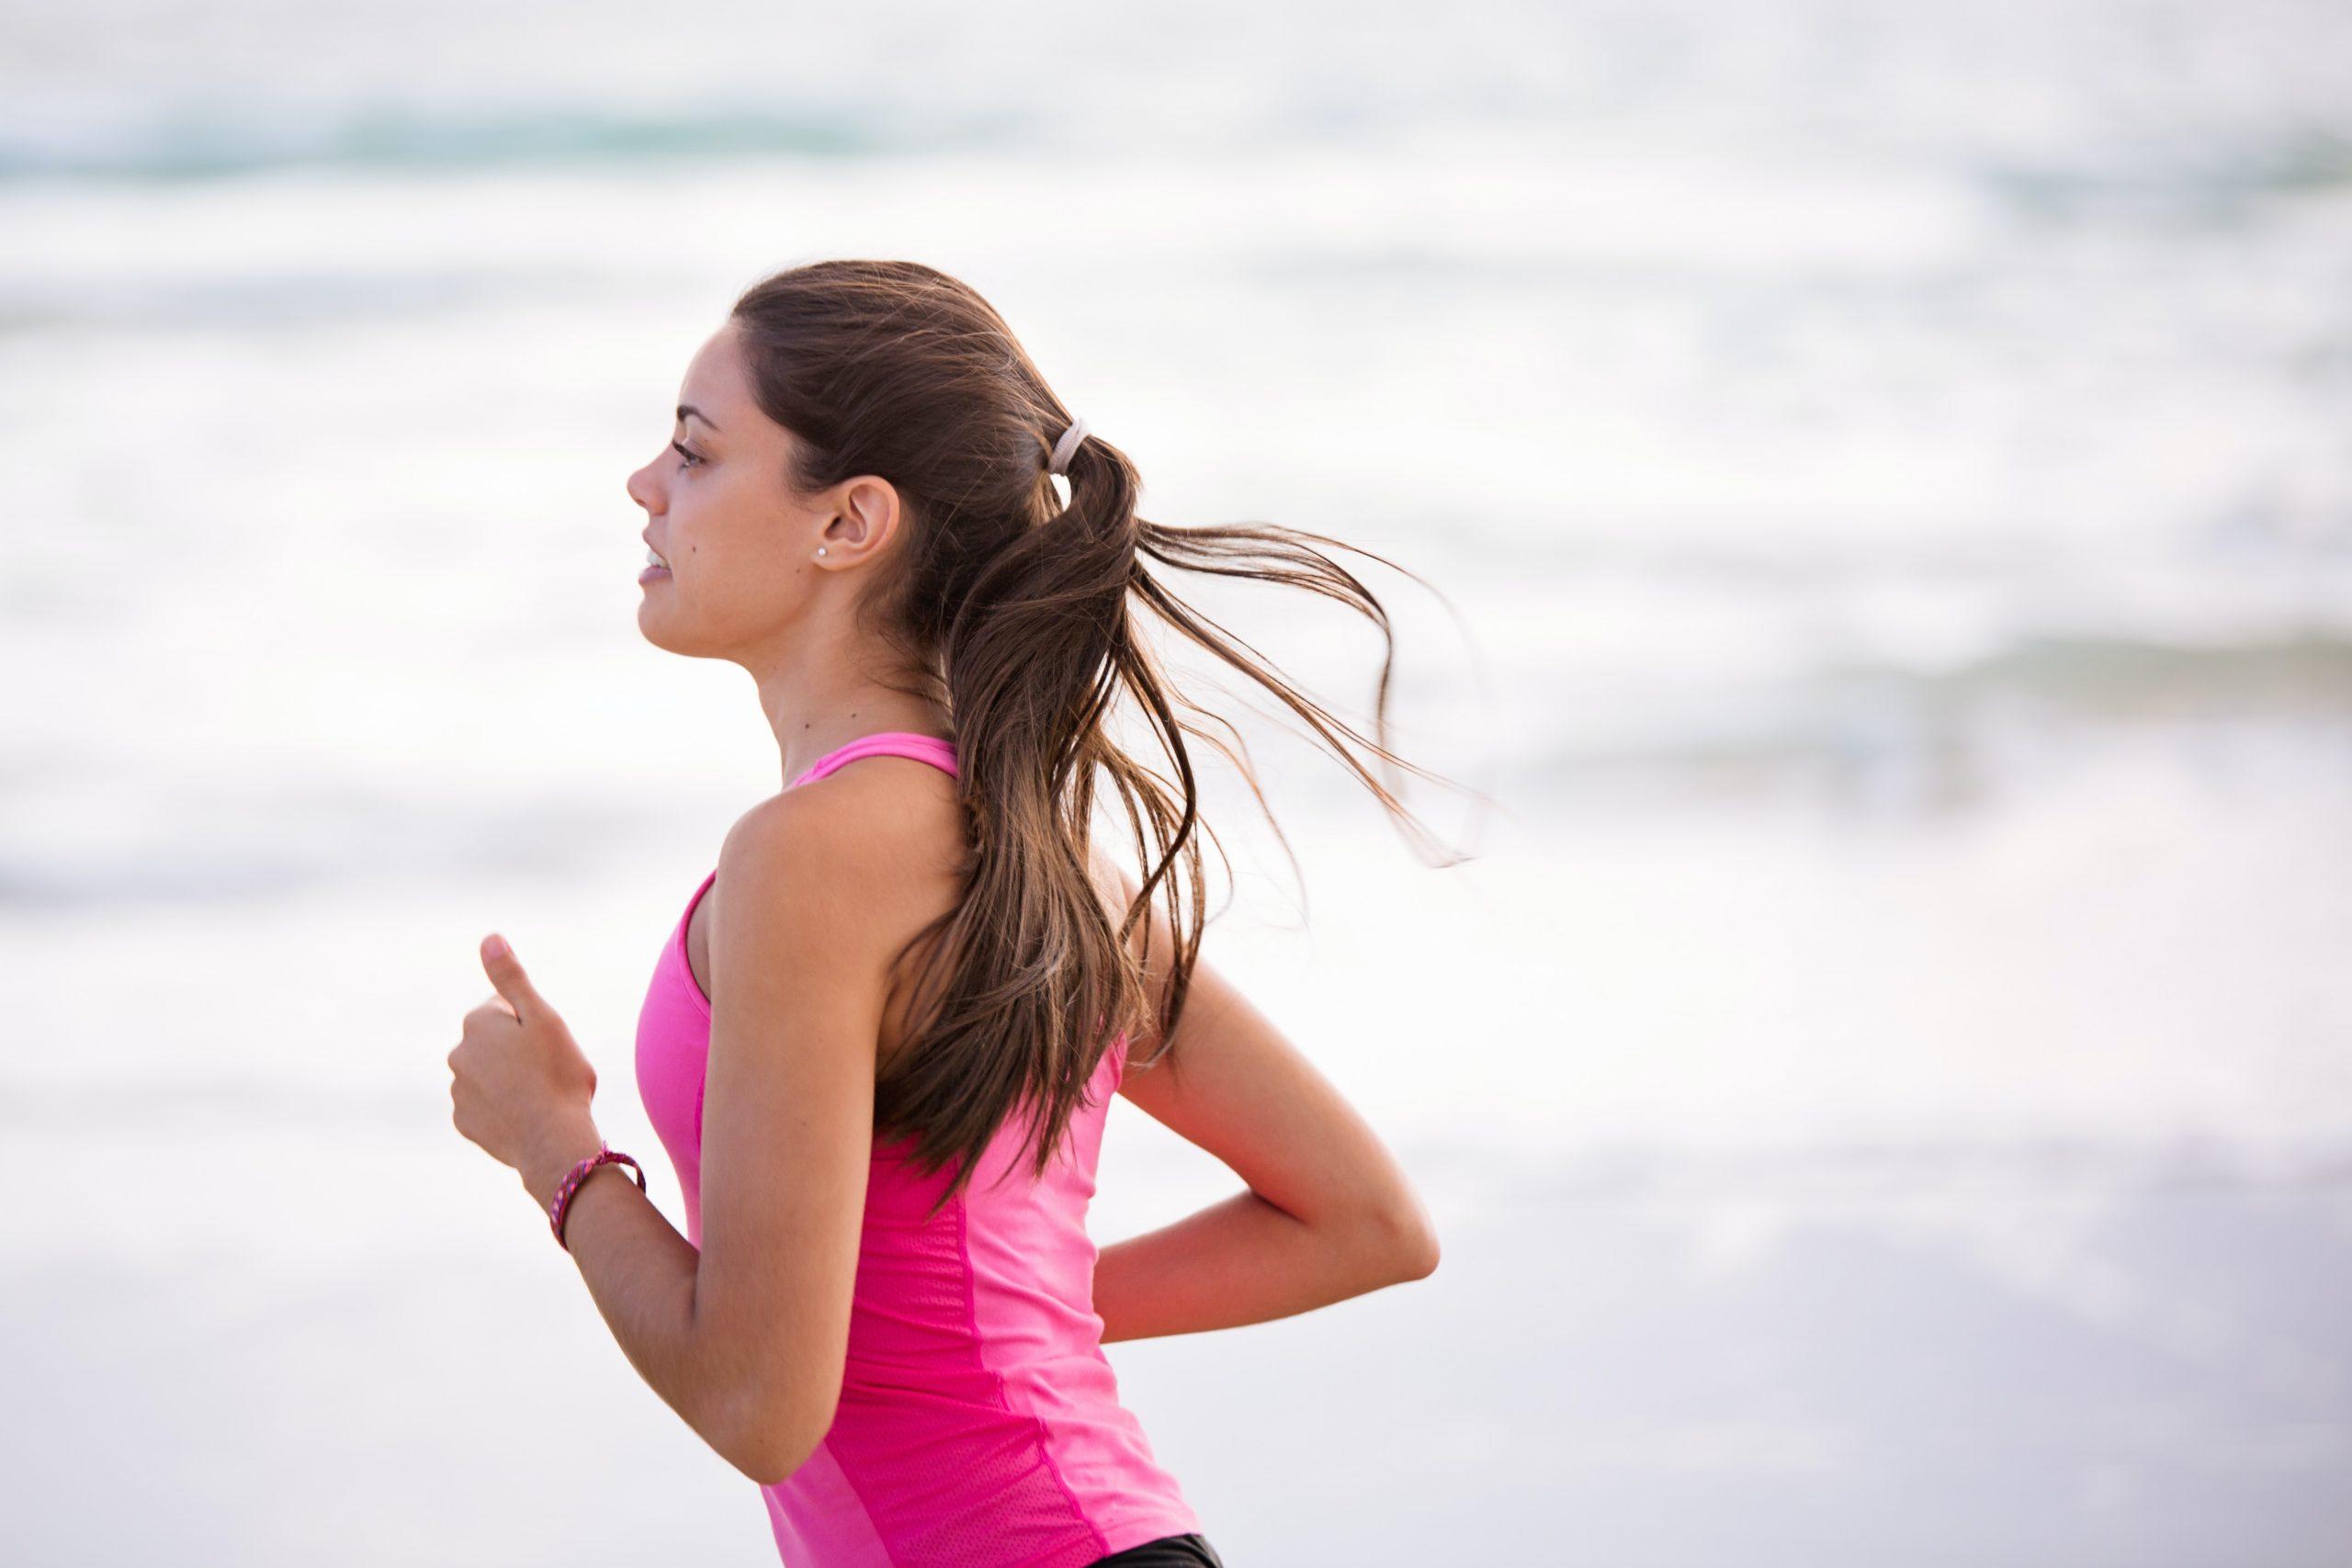 Get Running For #FitnessDay